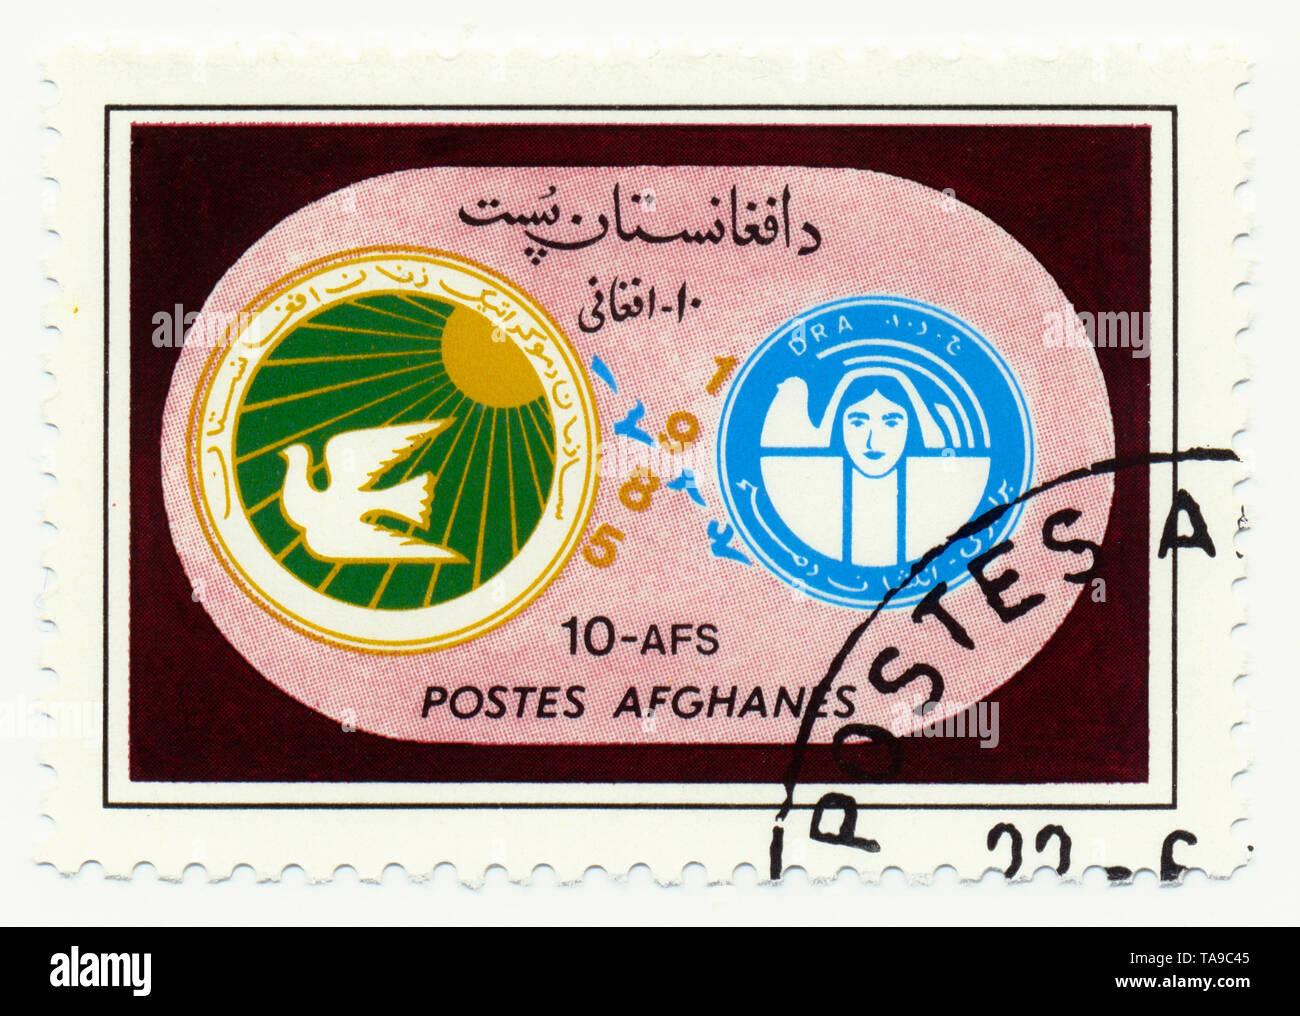 Historic postage stamps from Afghanistan, peace dove, Historische Briefmarken aus Afghanistan, Friedenstaube, 1985 - Stock Image